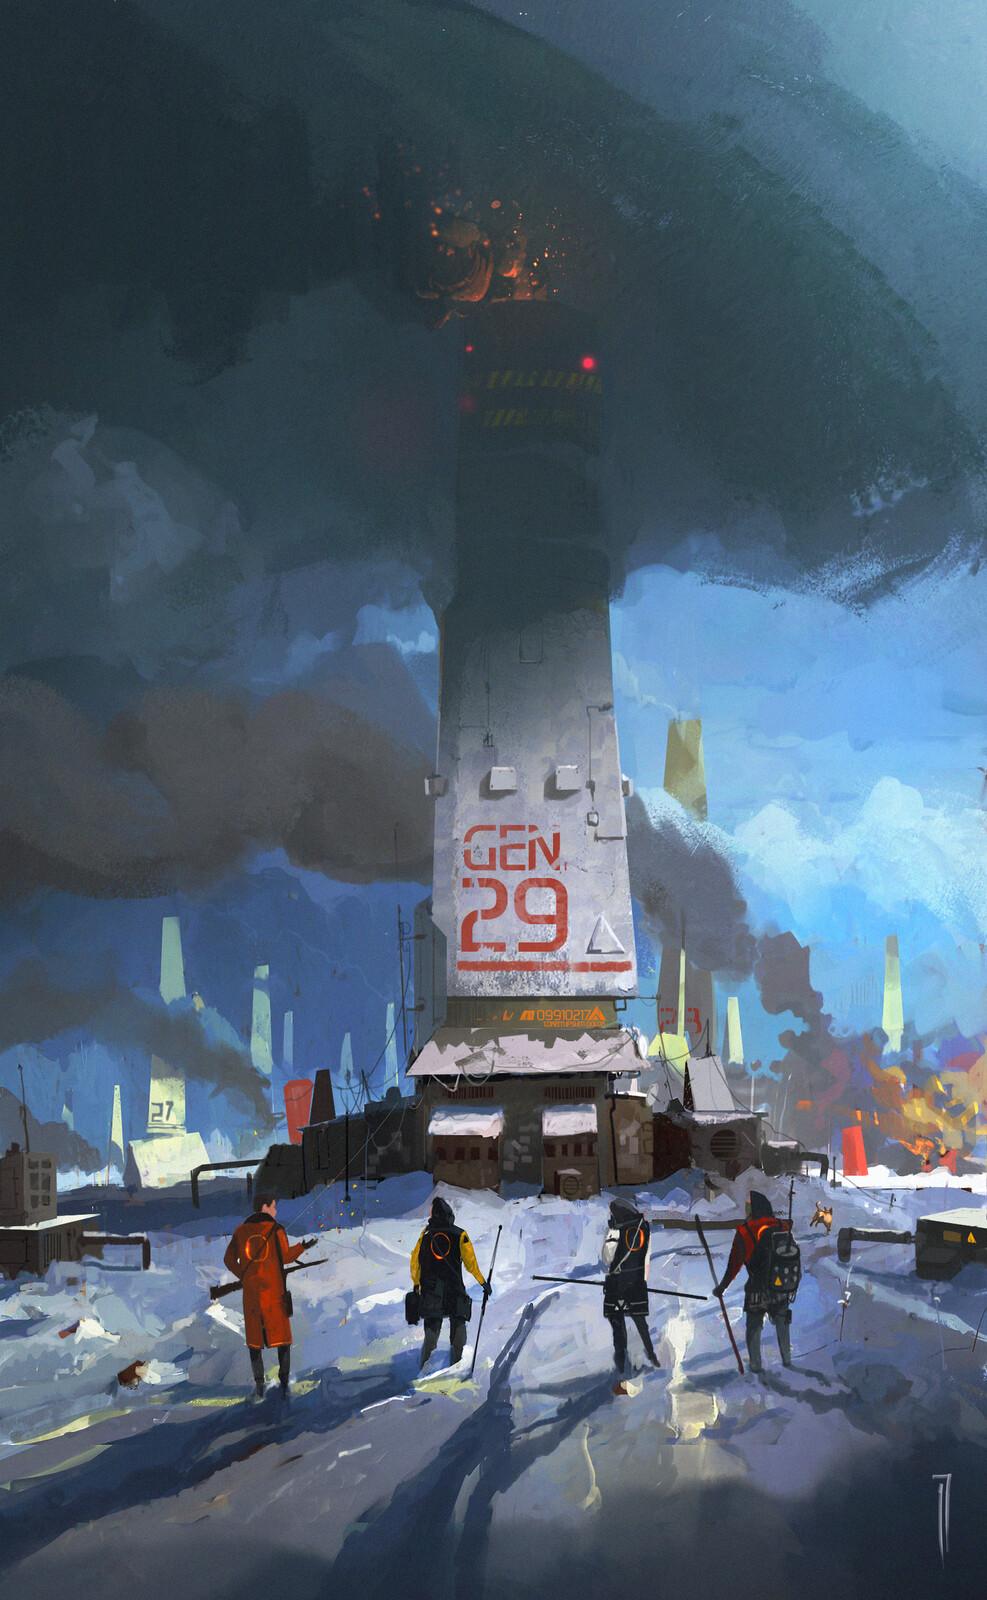 29th Generator